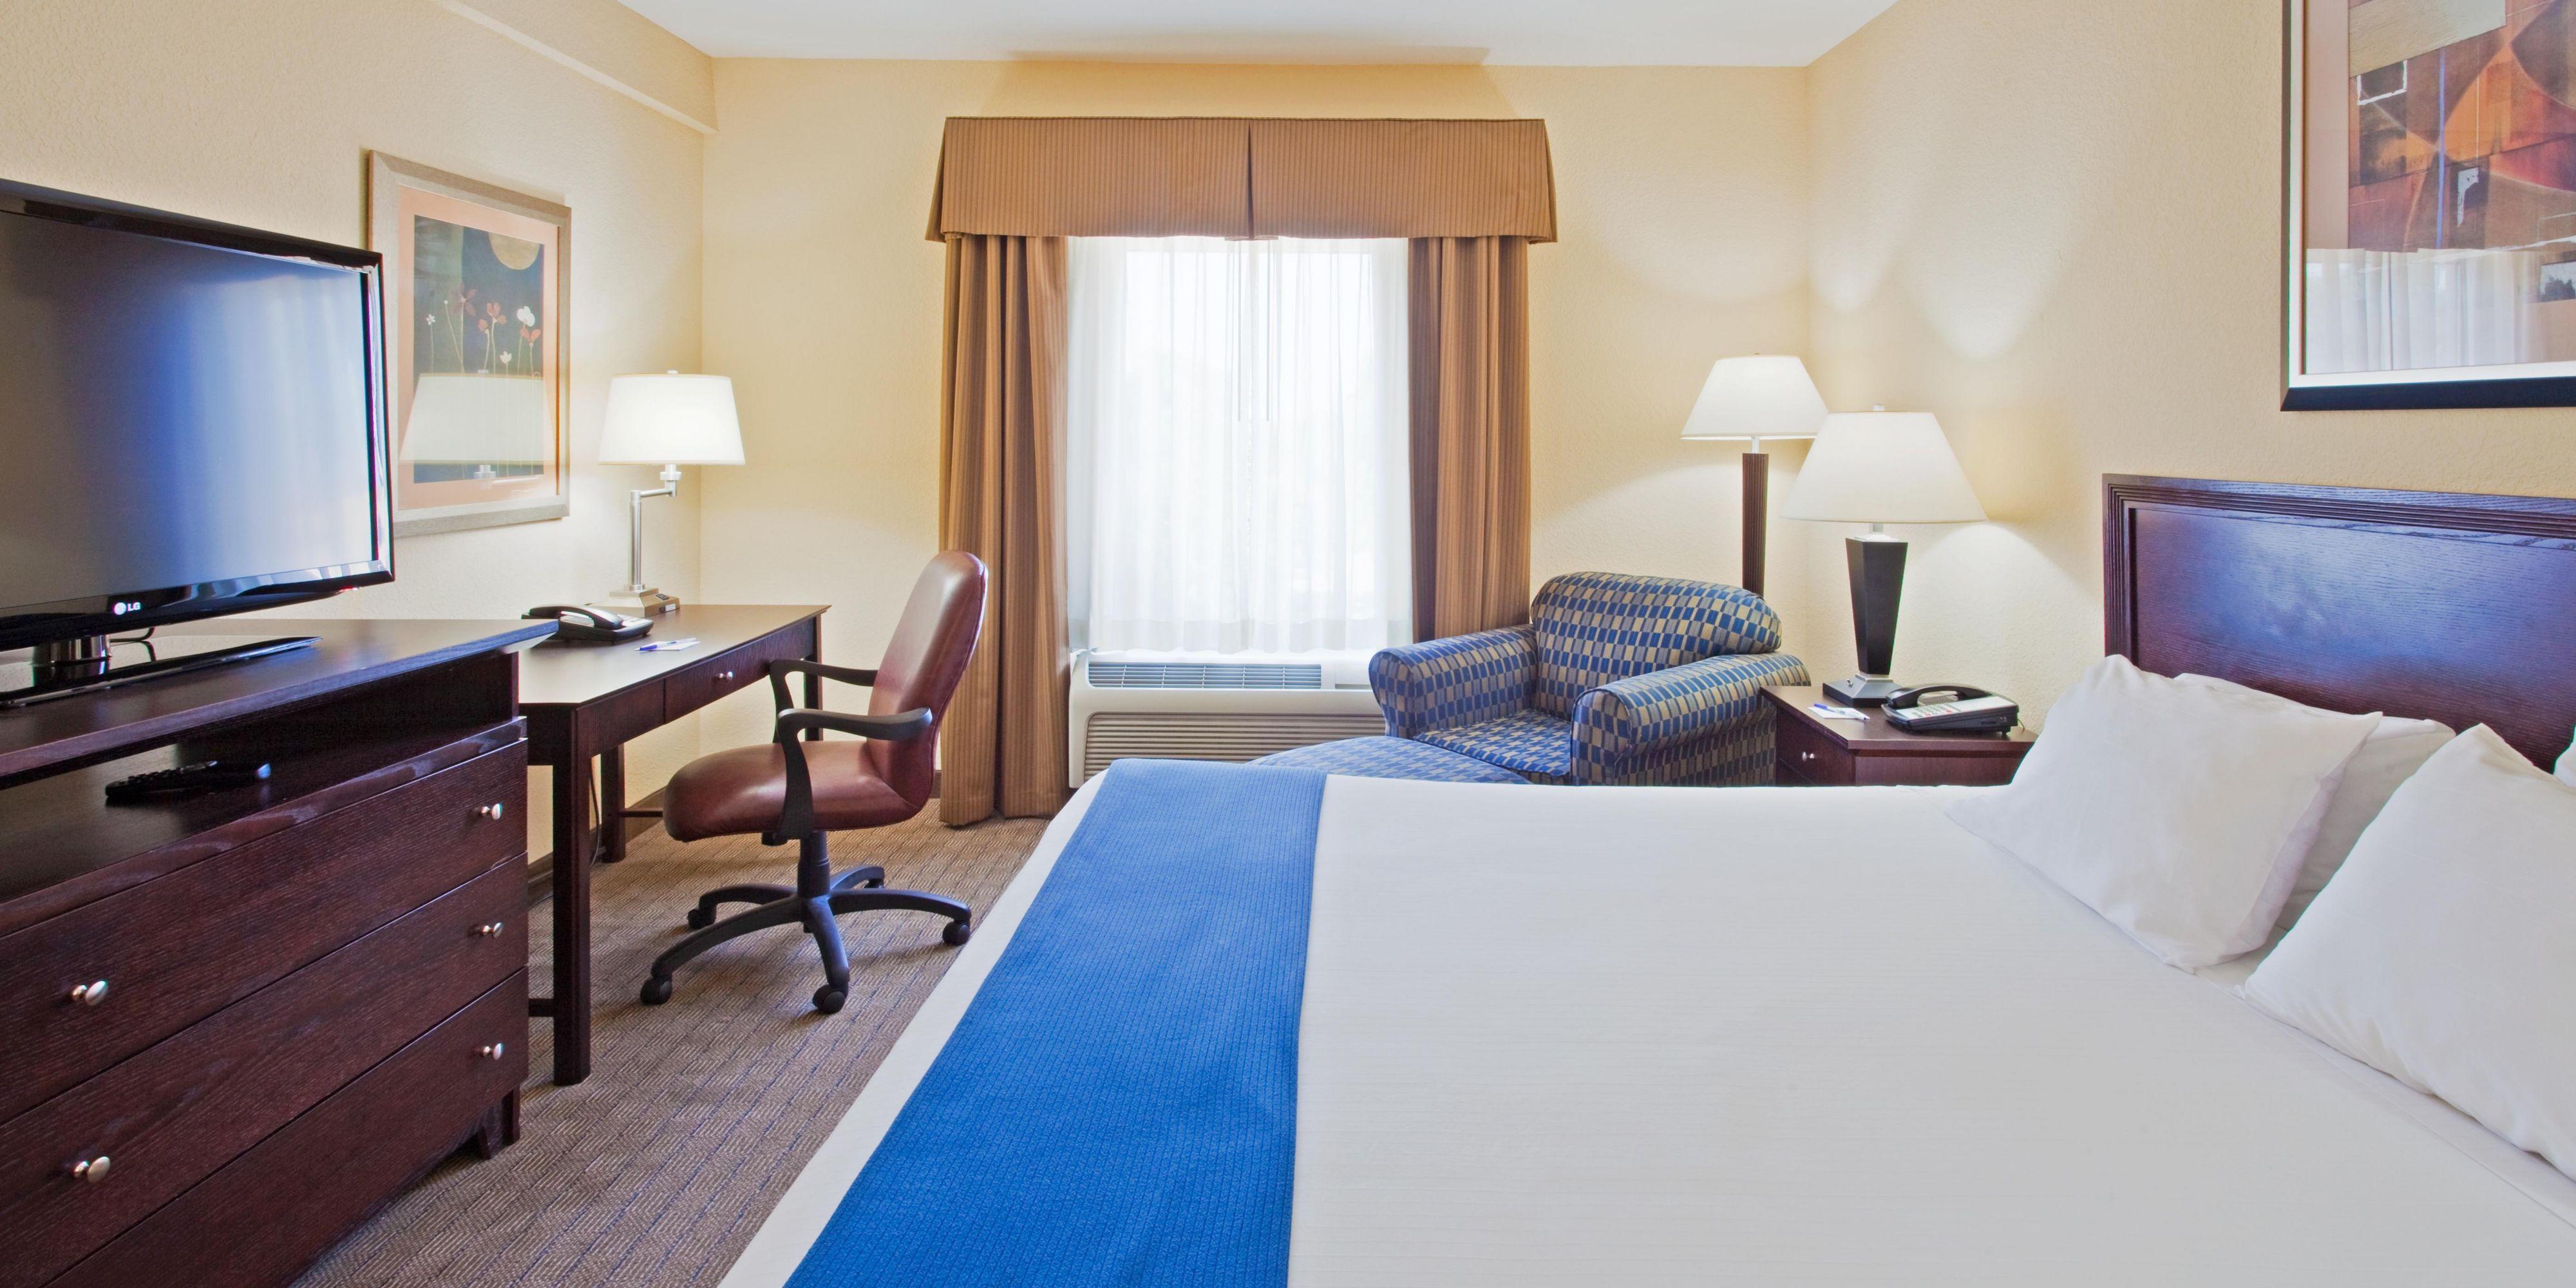 Holiday Inn Express Suites Clearwaterus 19 N Hotel By Ihg